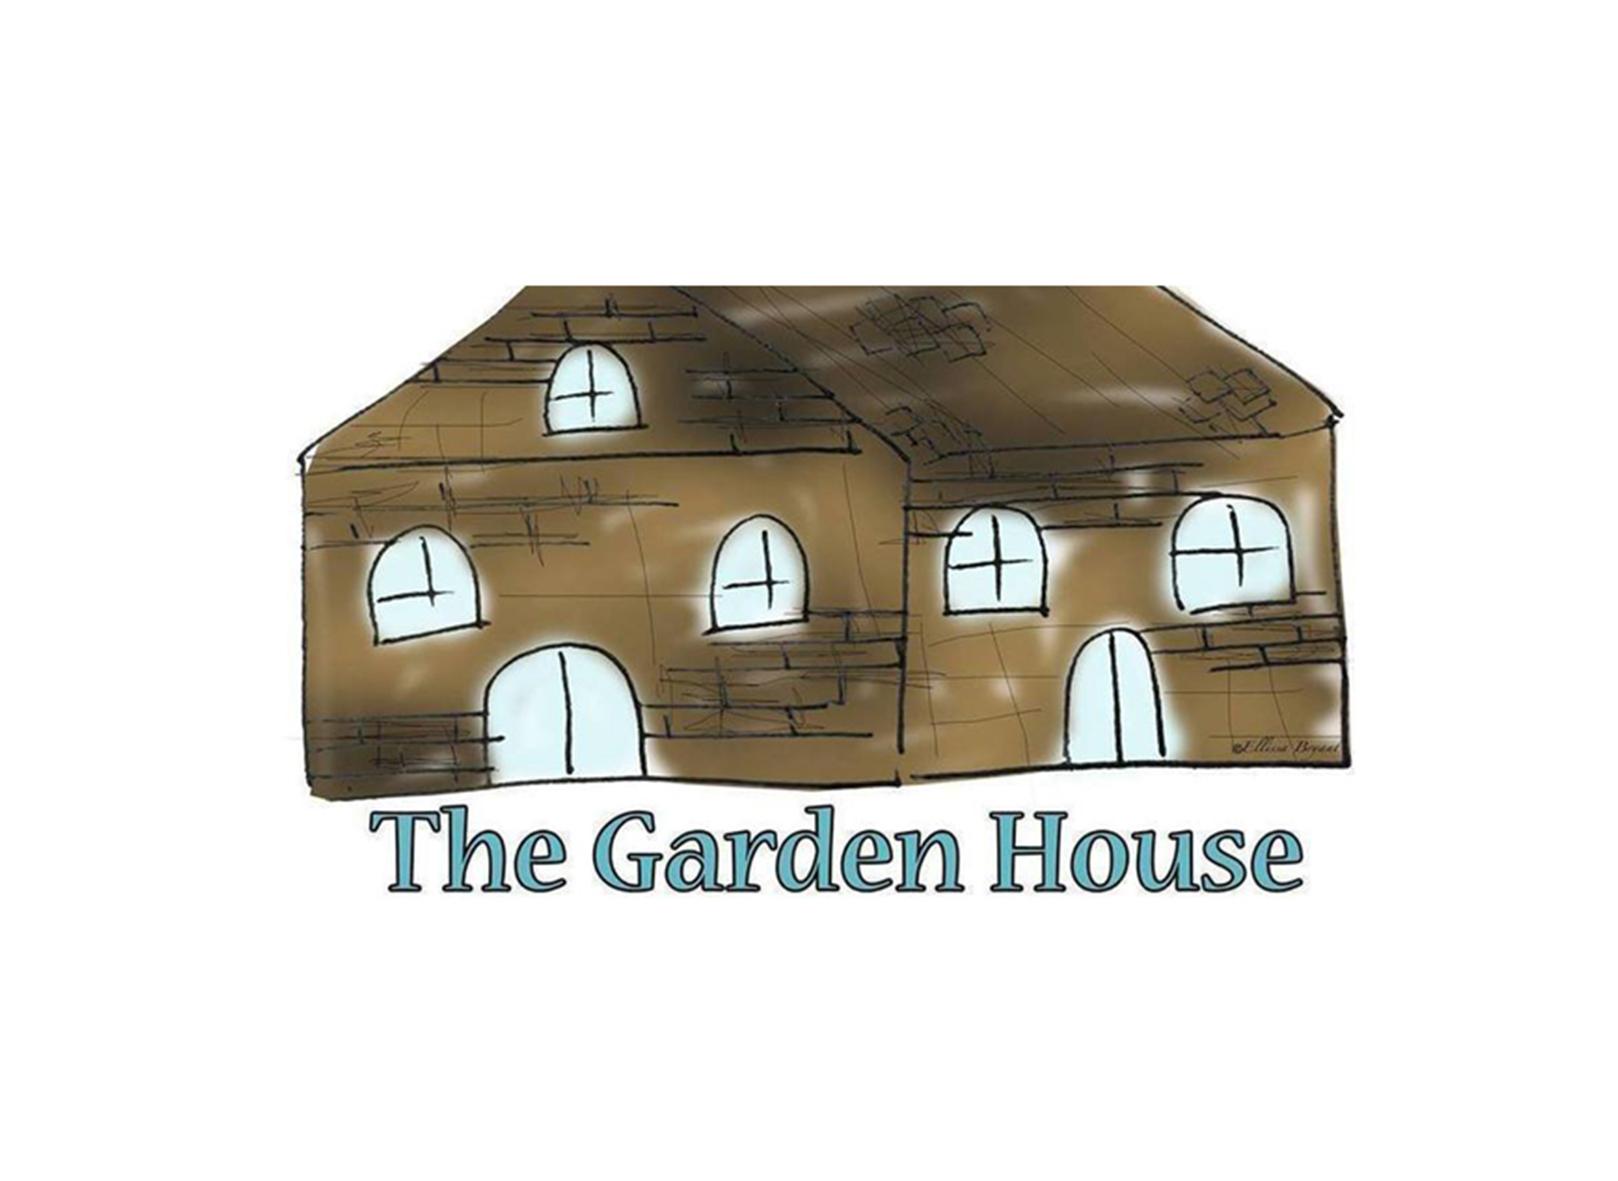 Garden House, Marple